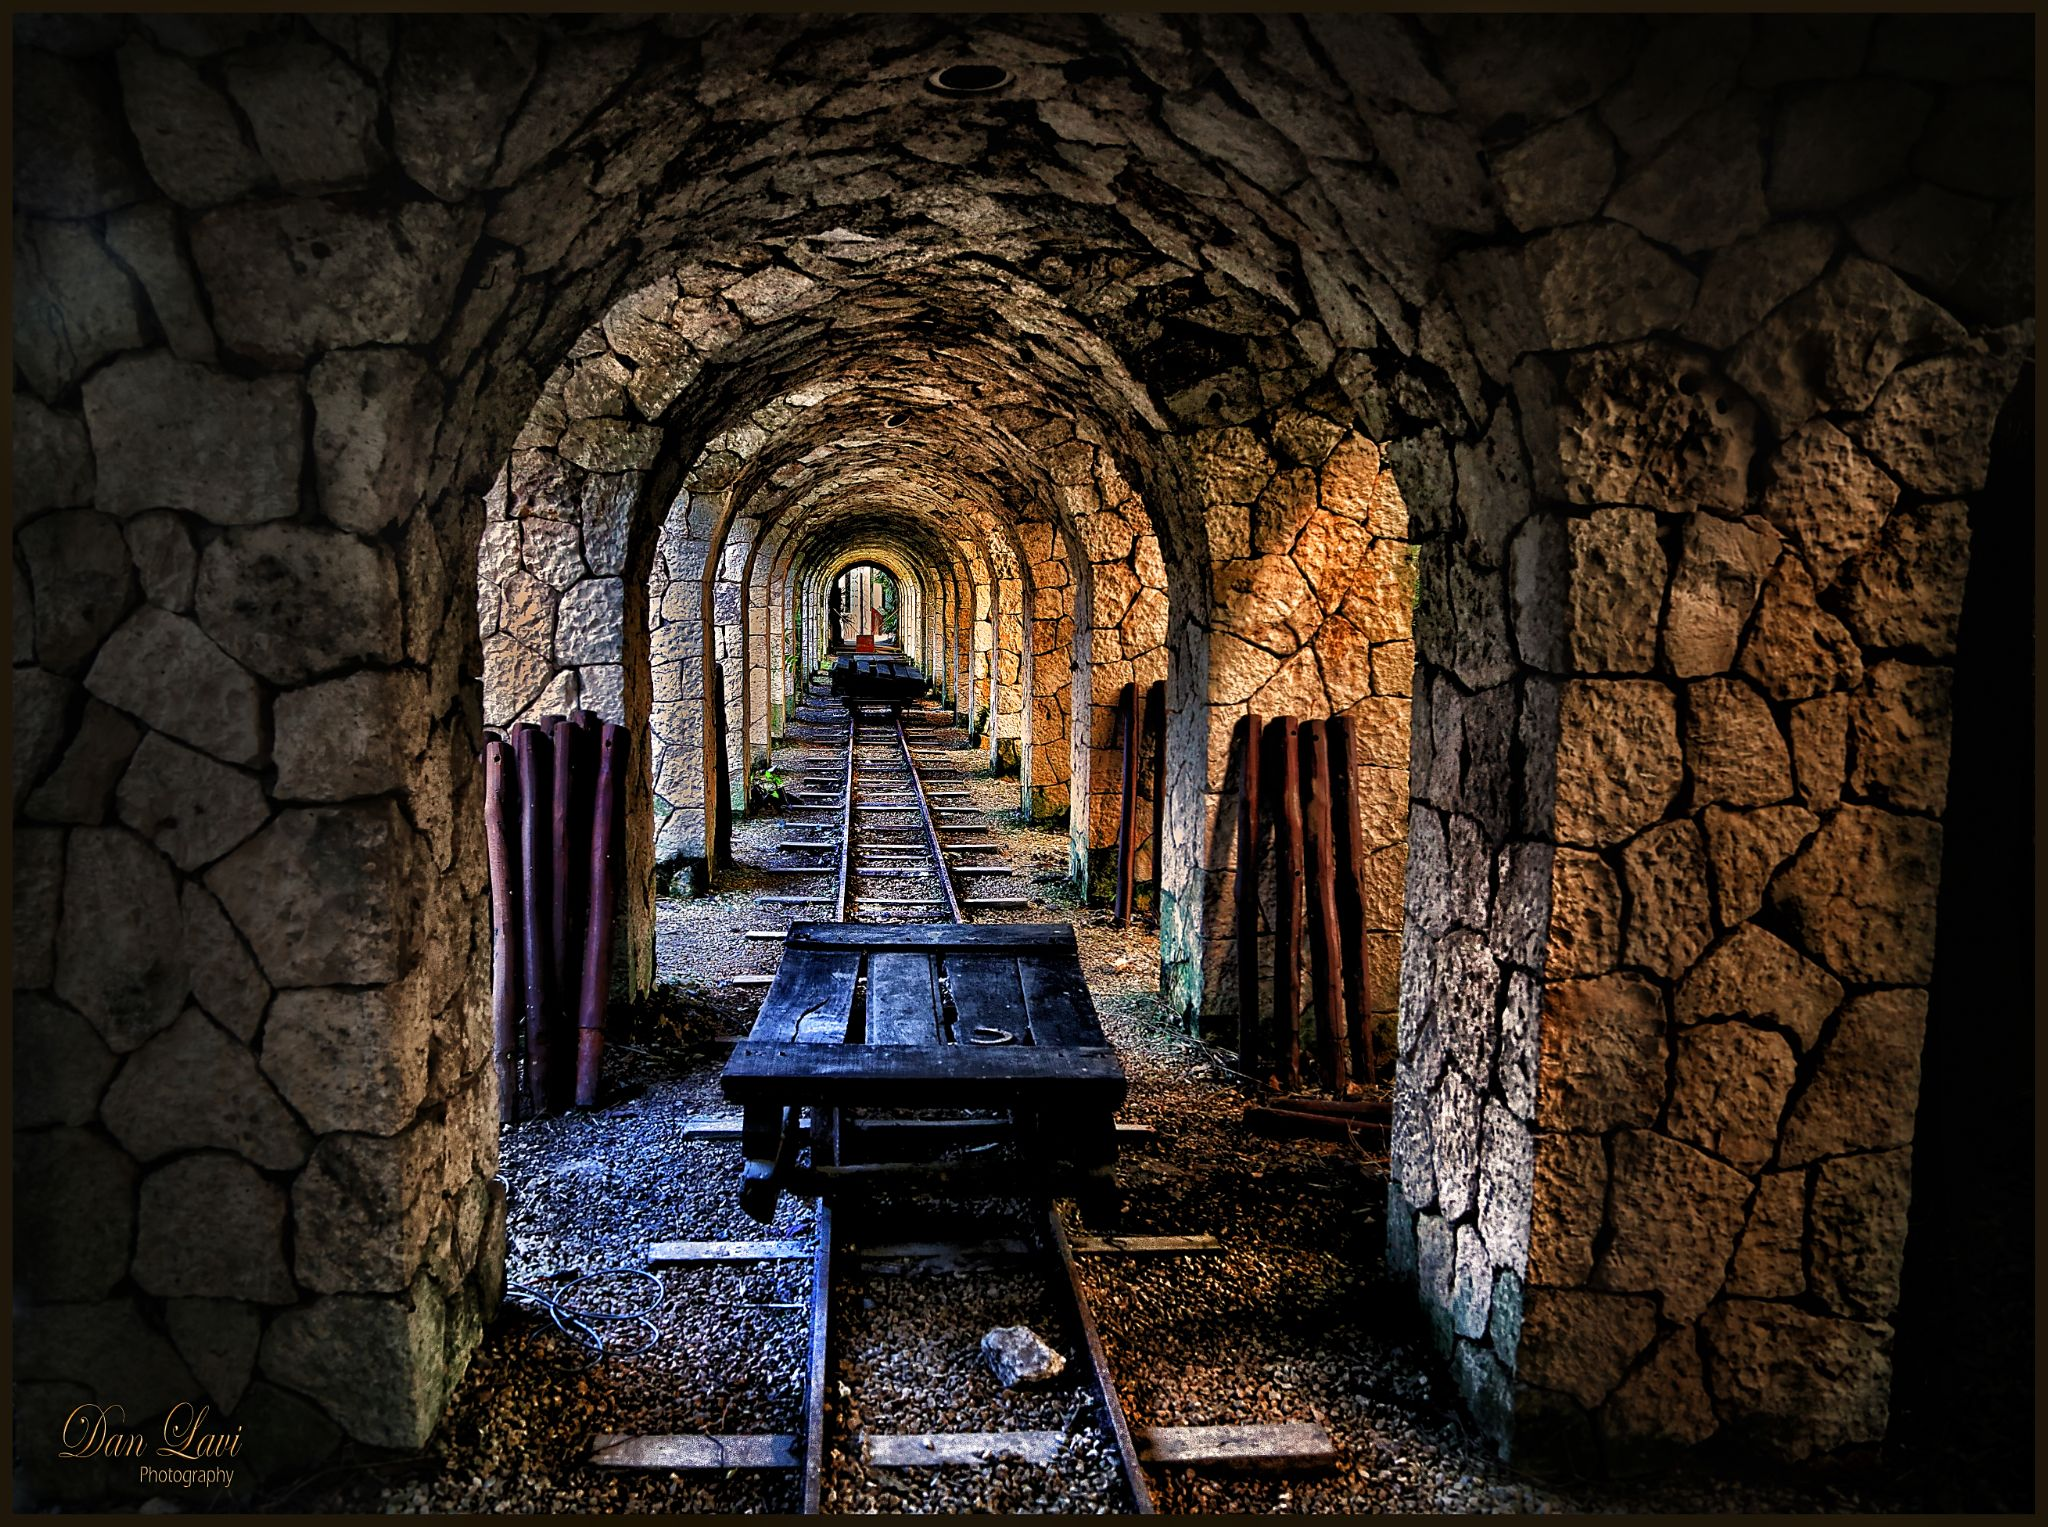 End f the tunnel  by Dani_Lavi